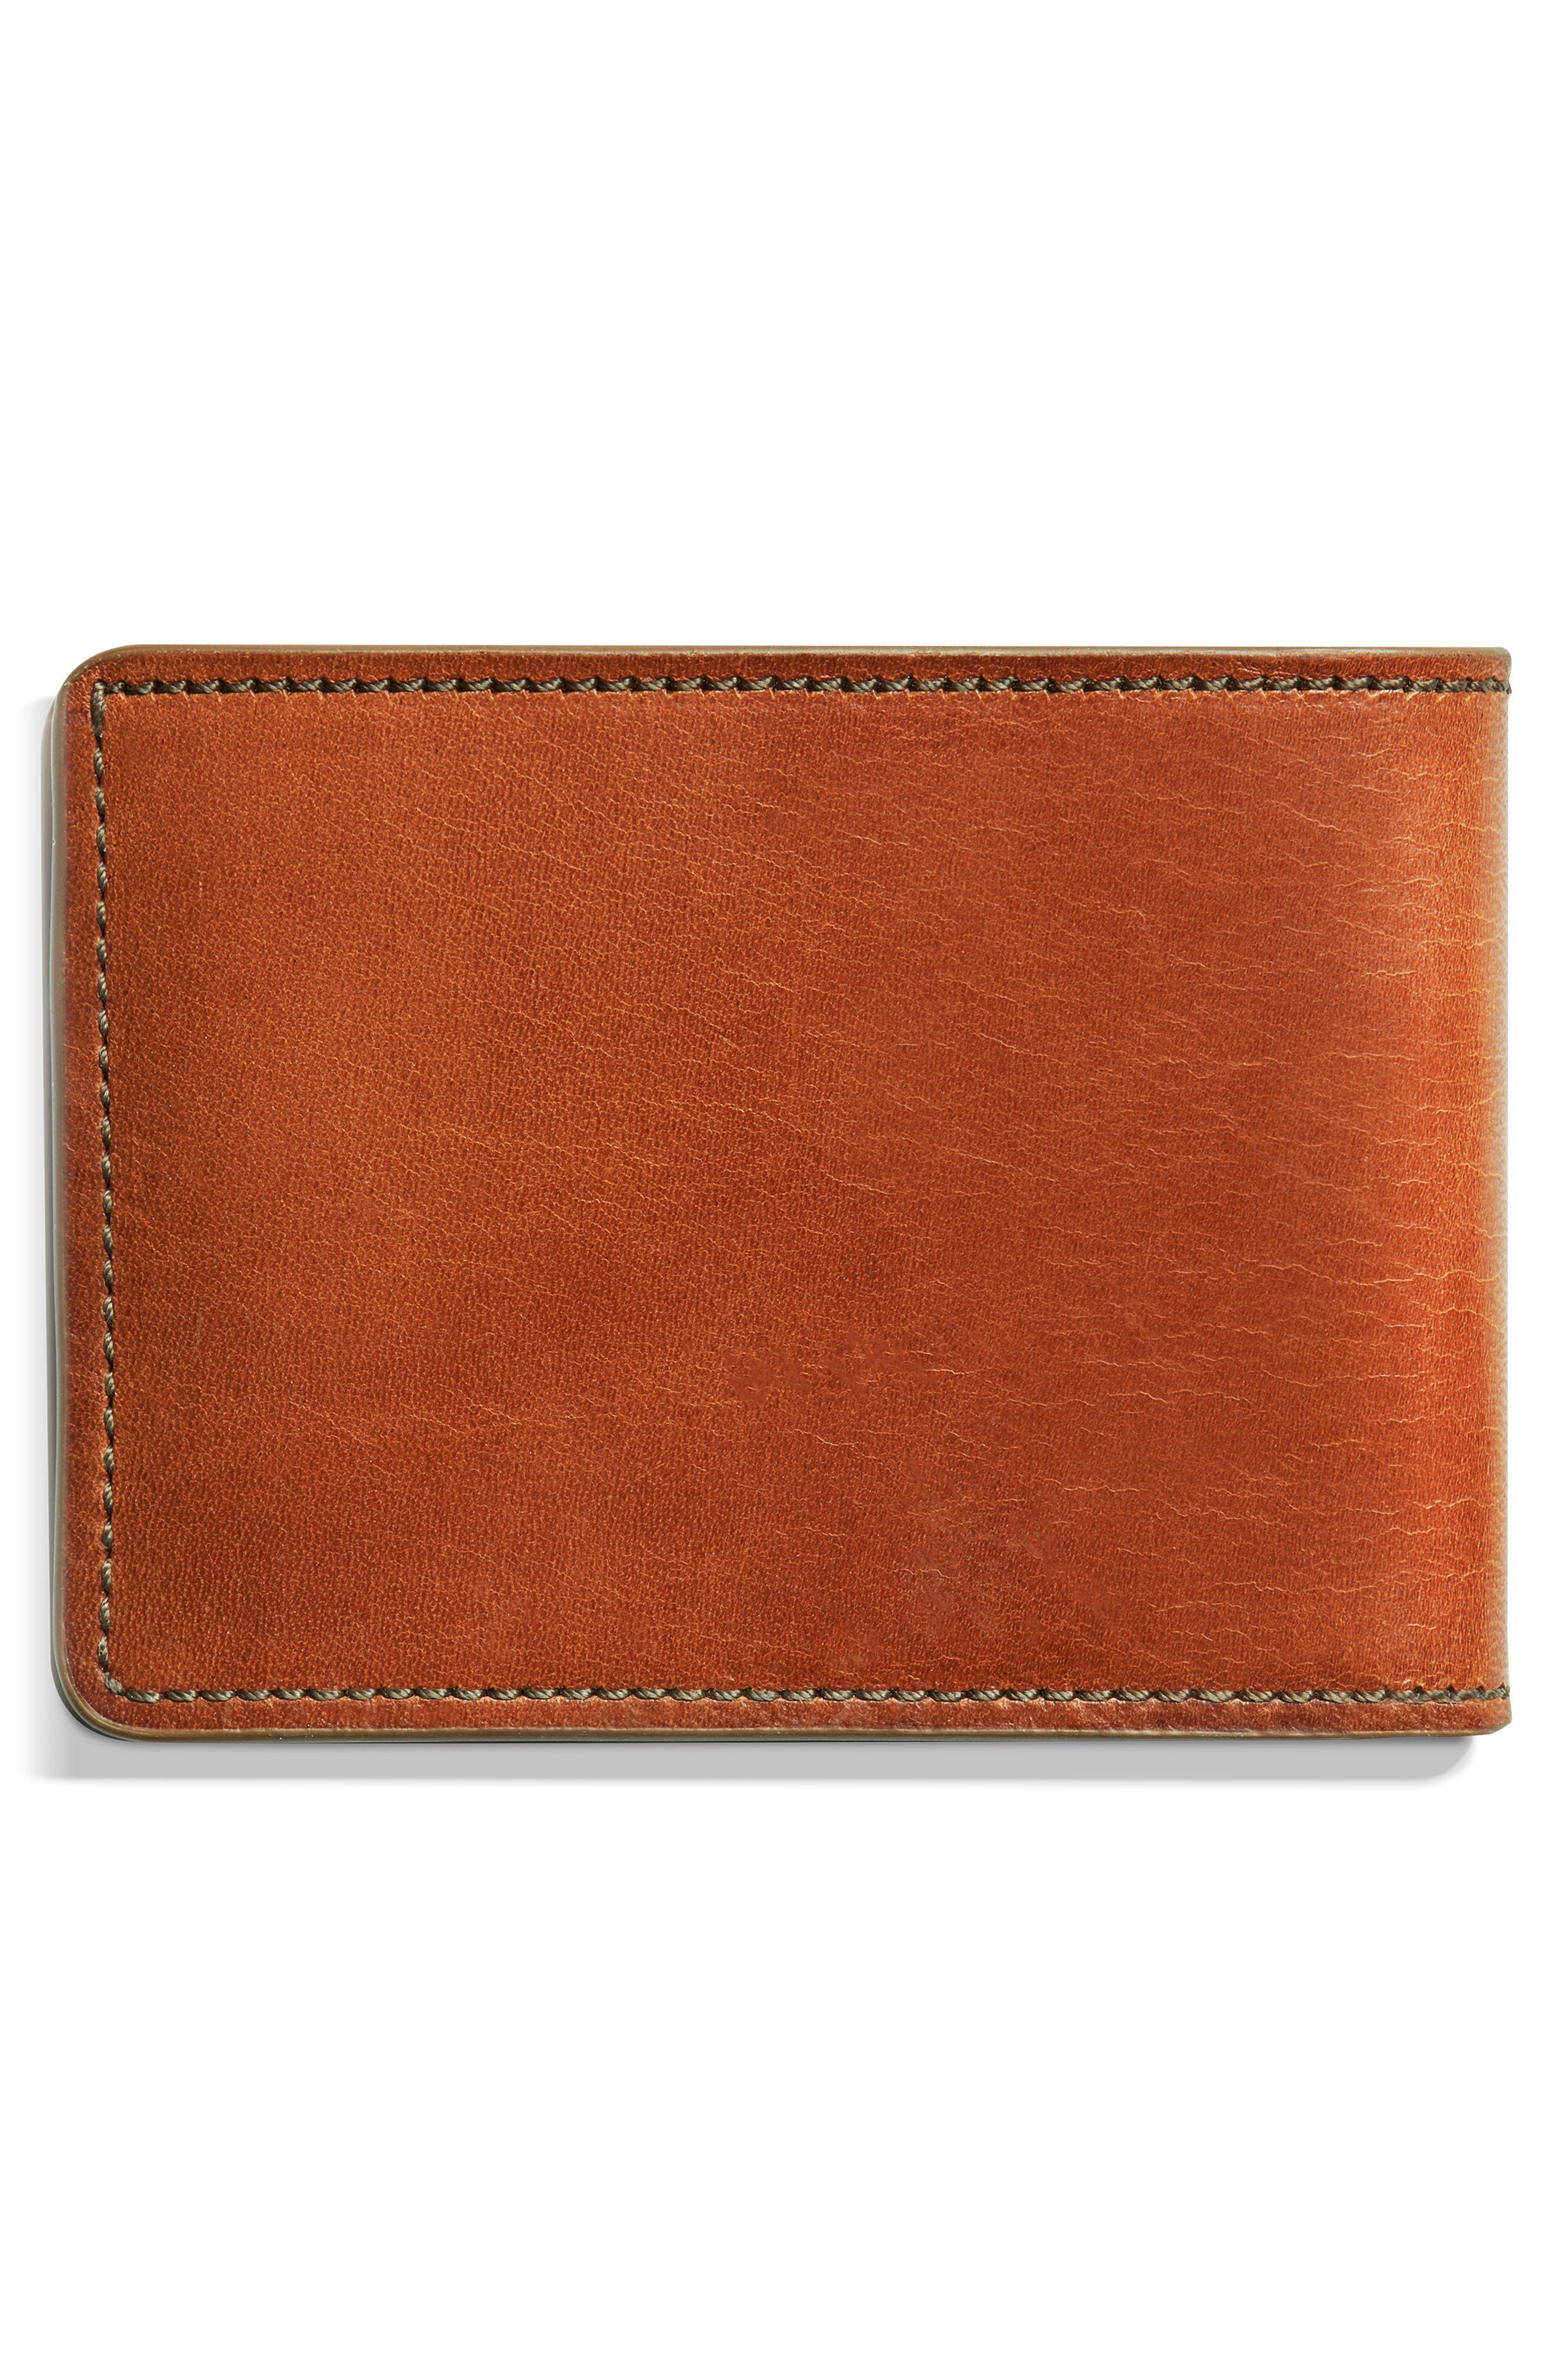 Harness Slim 2.0 Bifold Leather Wallet,                             Alternate thumbnail 3, color,                             BOURBON